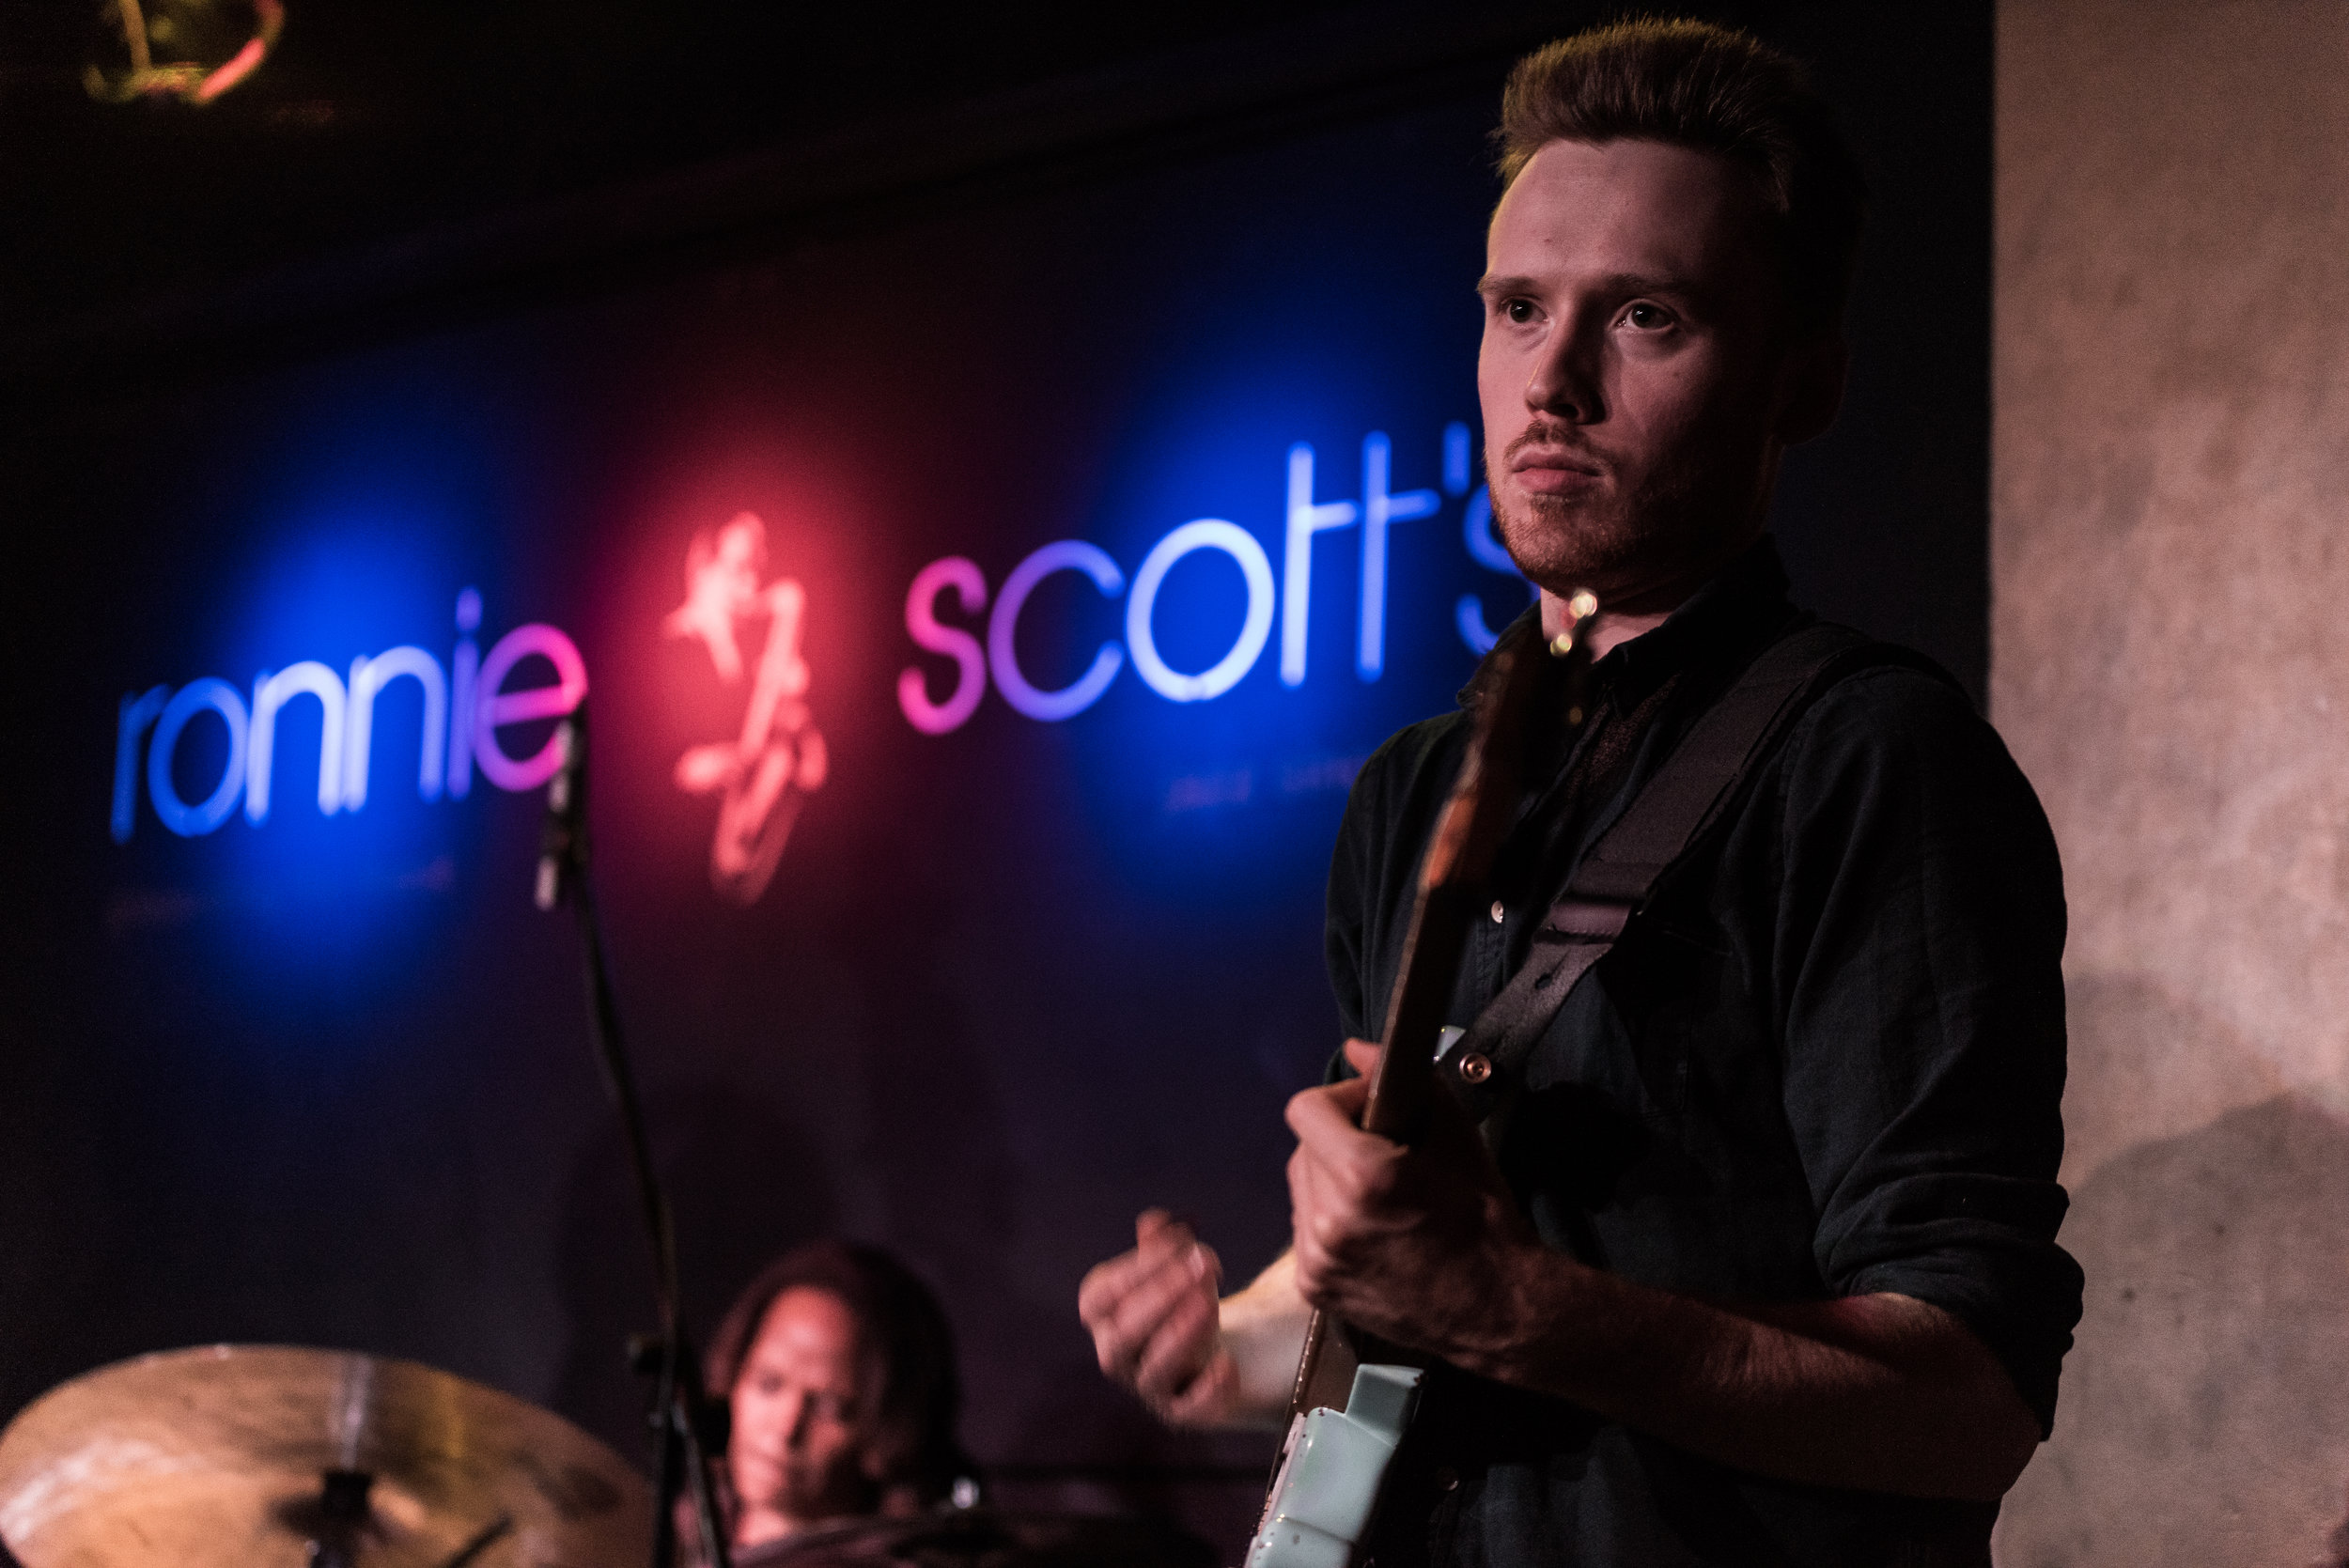 Ben Eunson performing with Terri Lyne Carrington at Ronnie Scotts, London 2015  (Photo by Benjamin Amure)